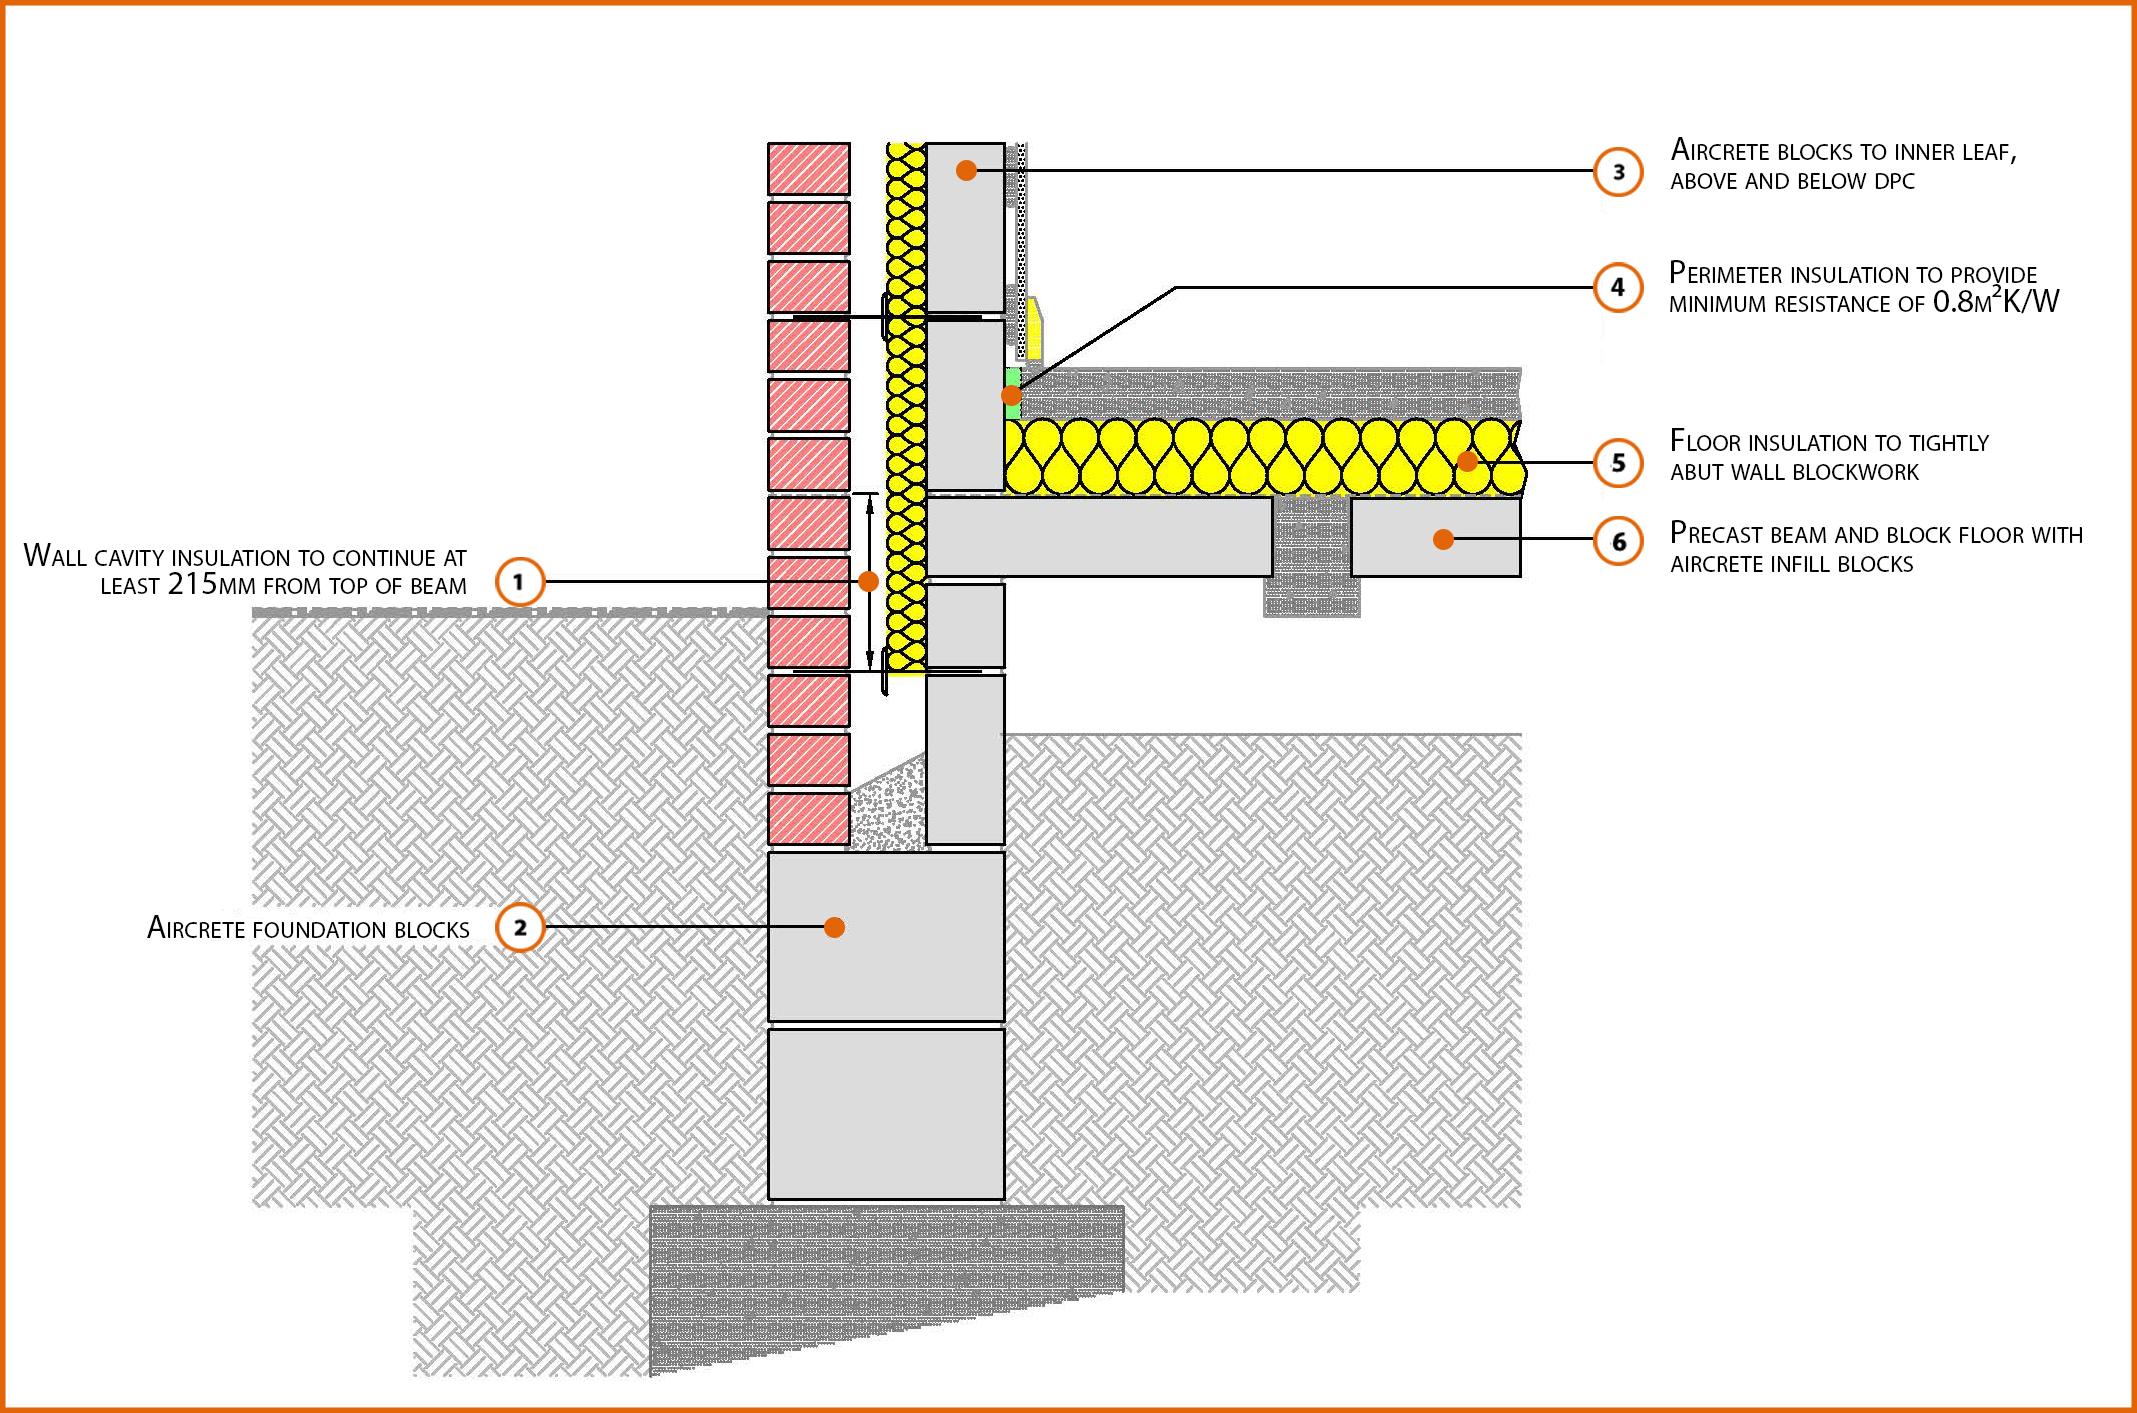 E5mcpf20 Suspended Beam And Block Floor Insulation Above